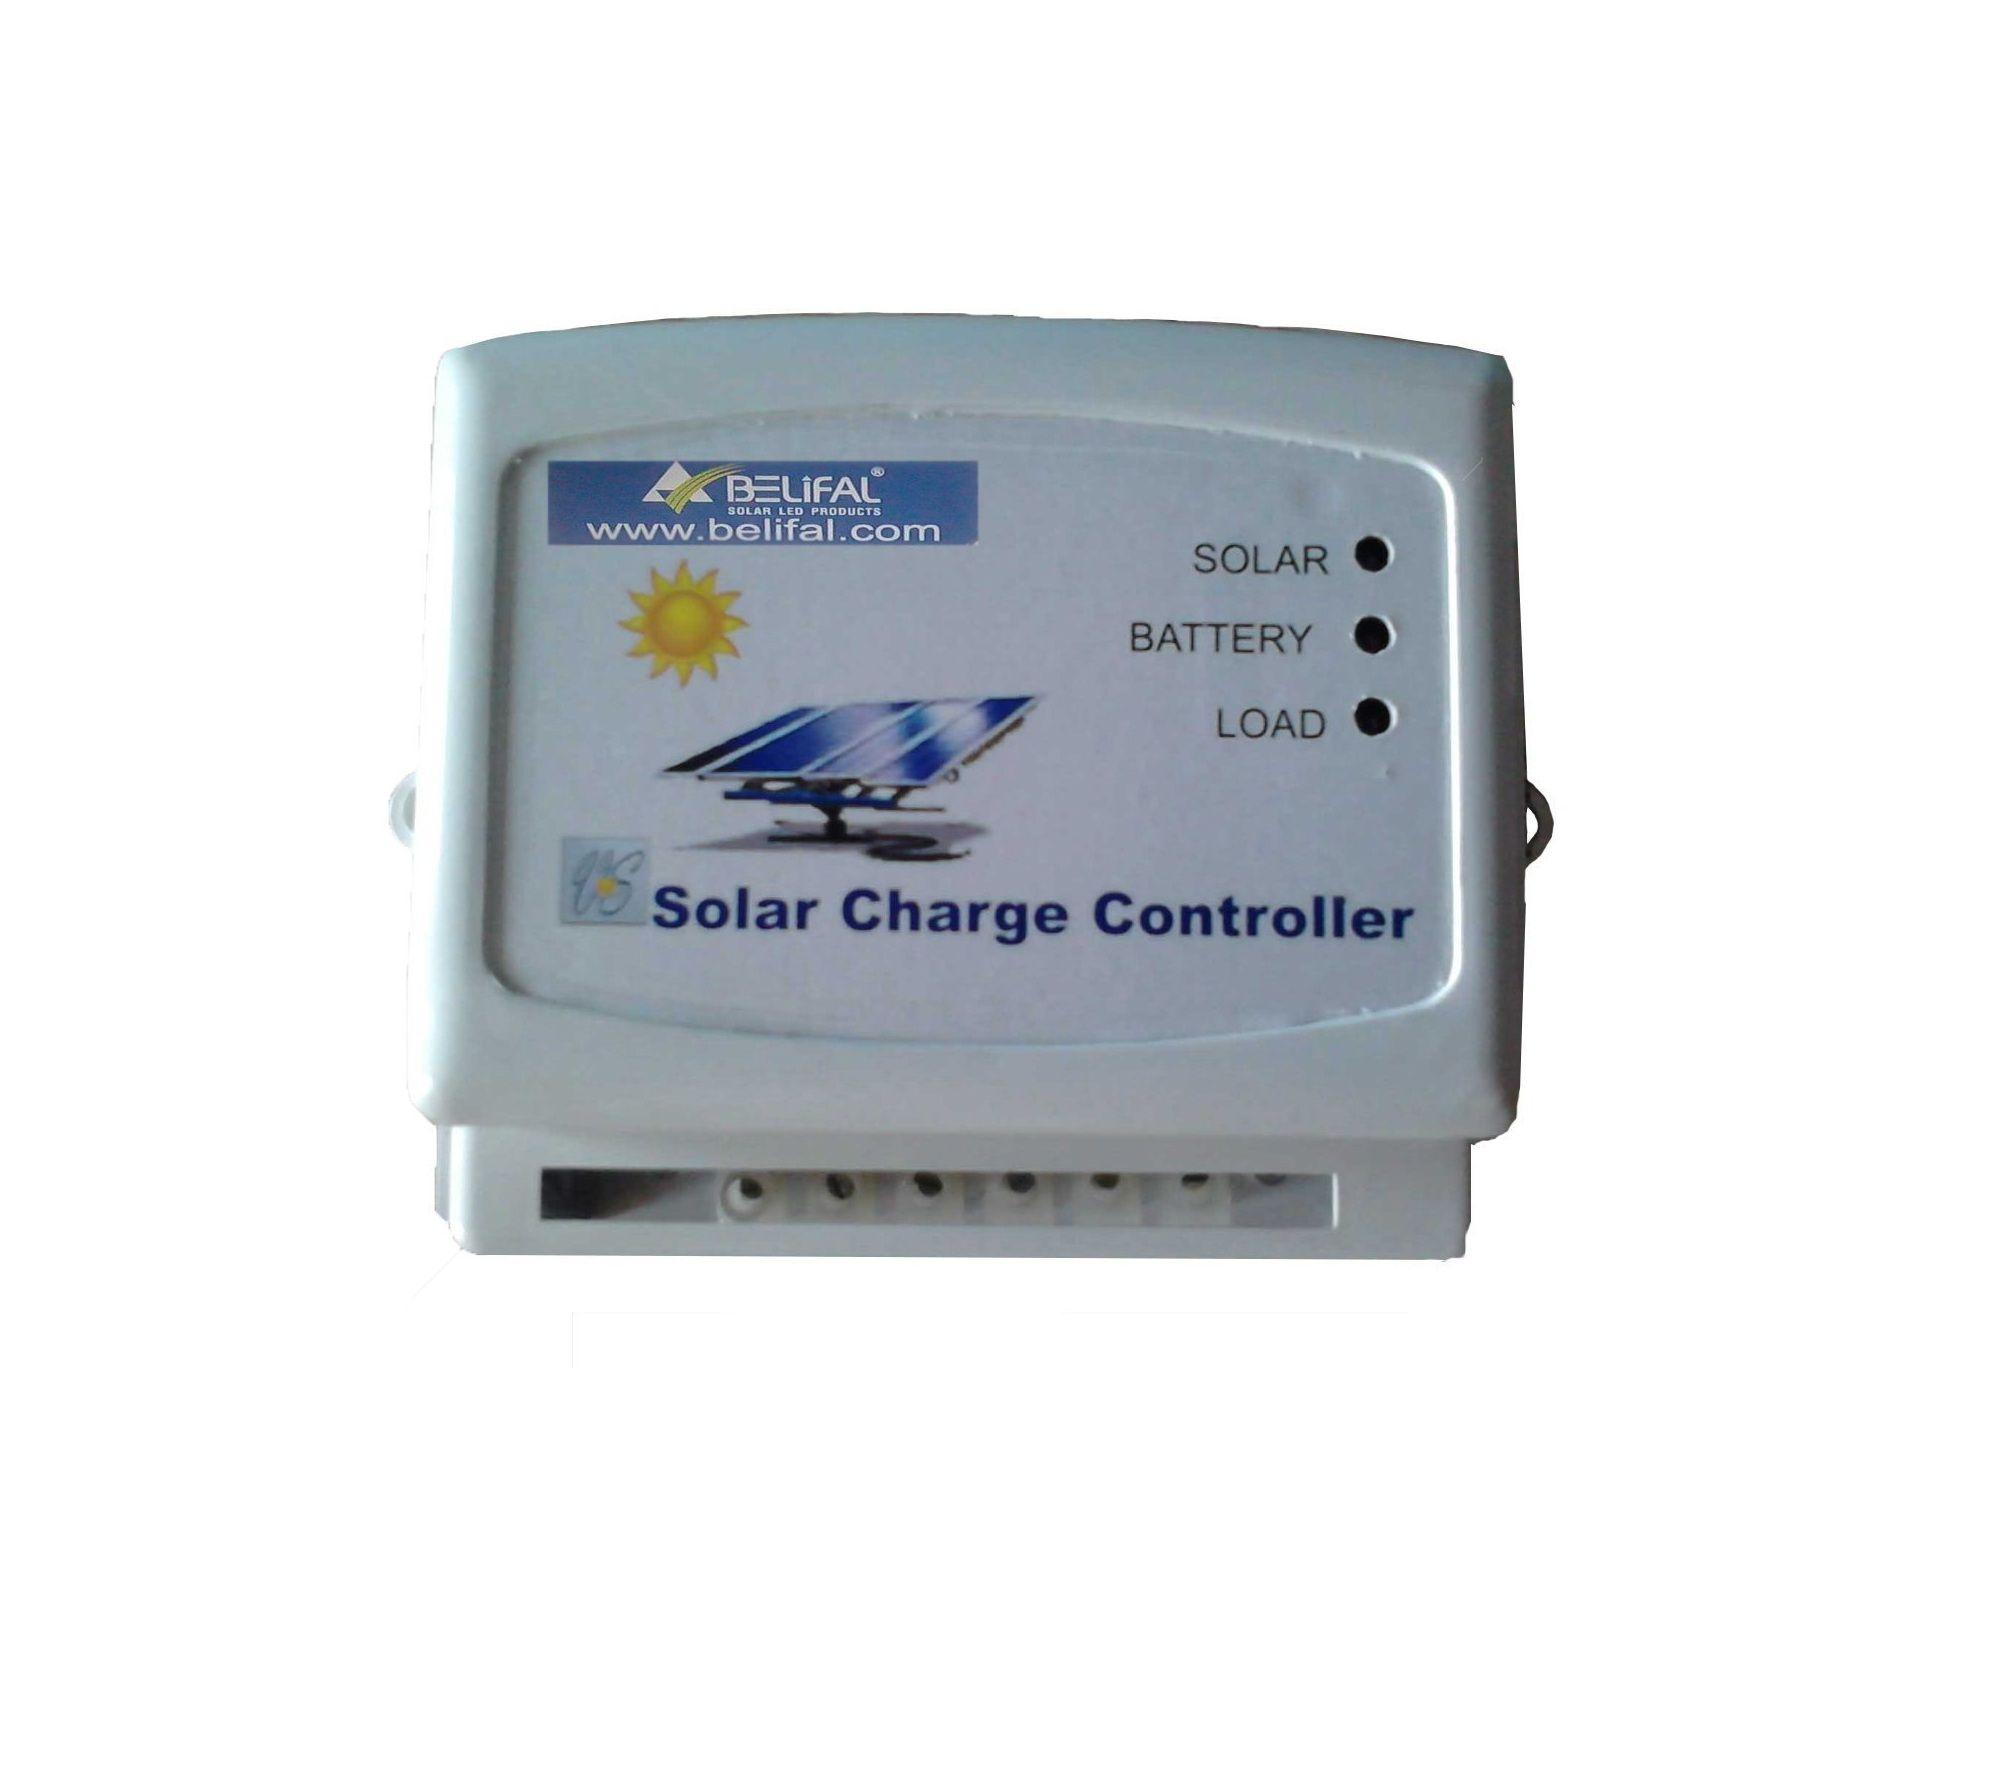 Belifal 12v 24v Auto 10a Solar Charge Controller Pinterest Pwm Led Dc Bulb Usb Tube Lights Lantern Torch